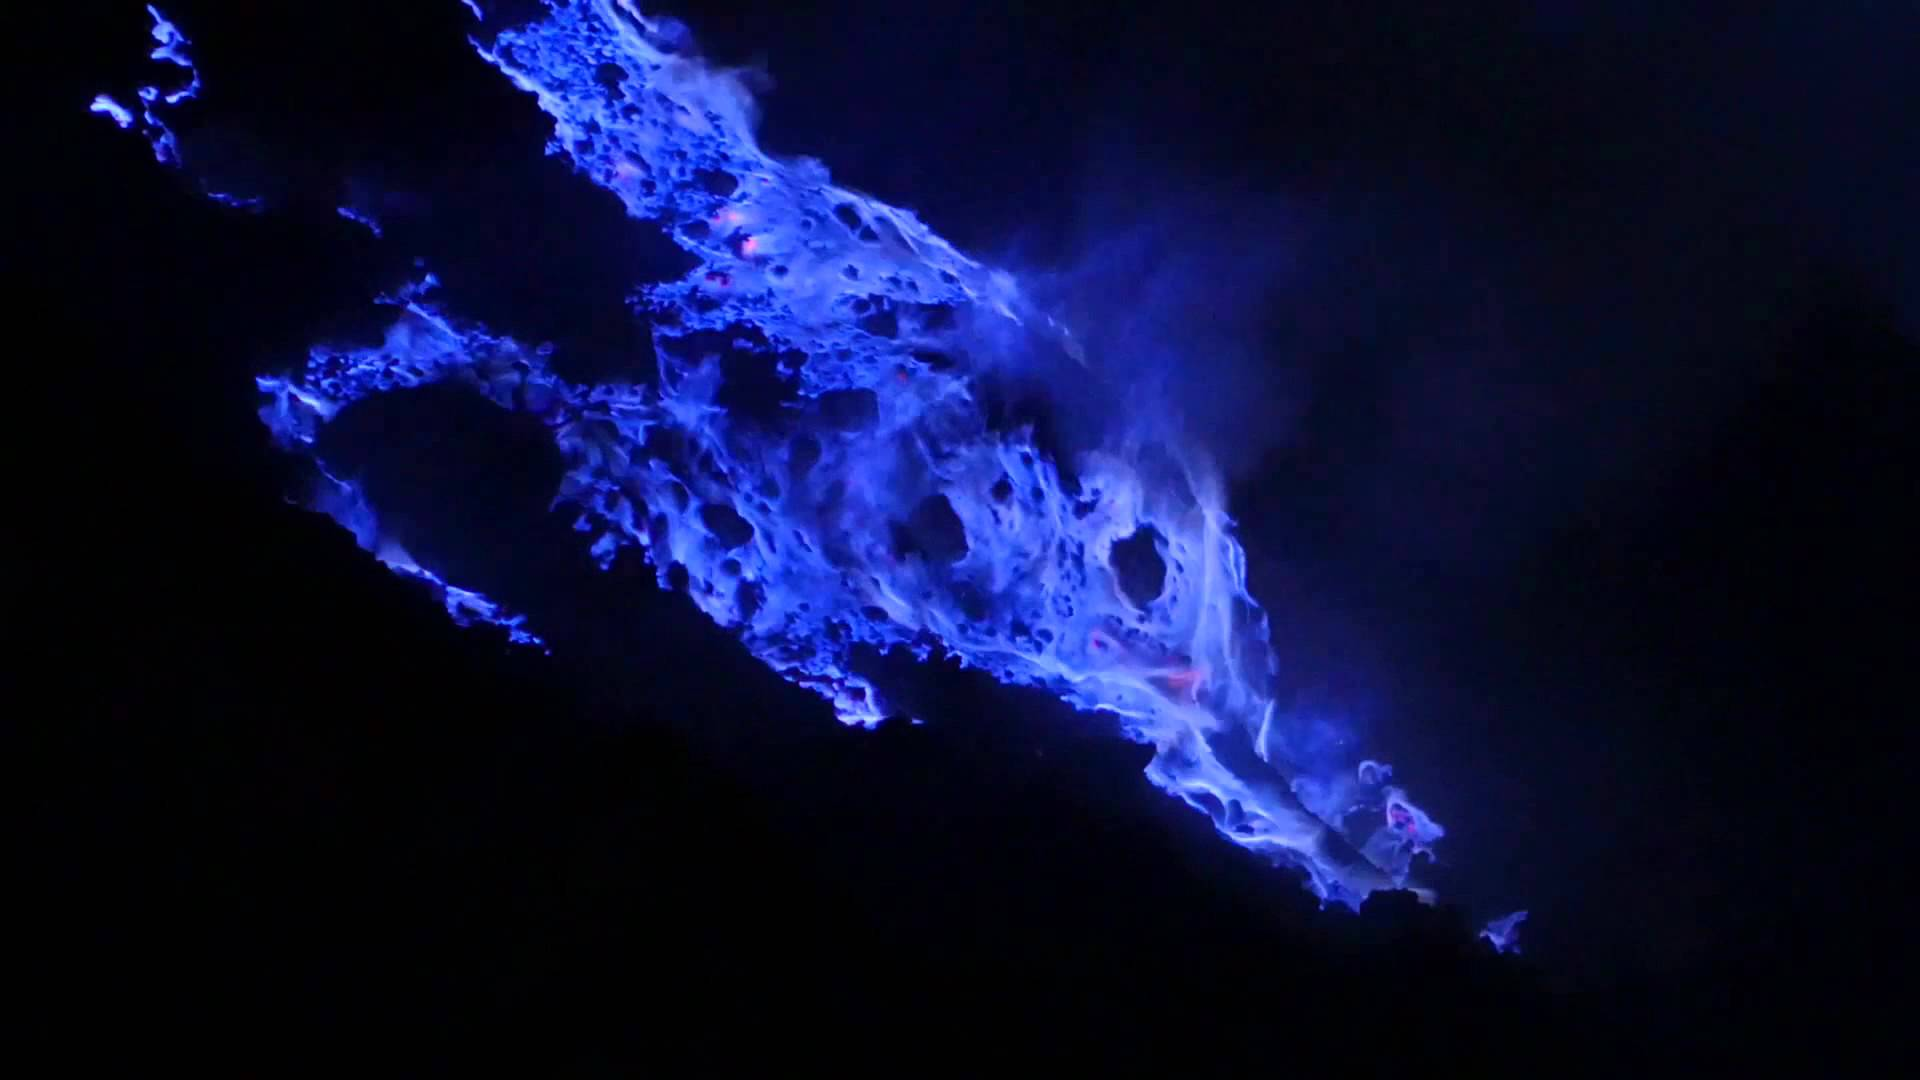 Blue fire photo